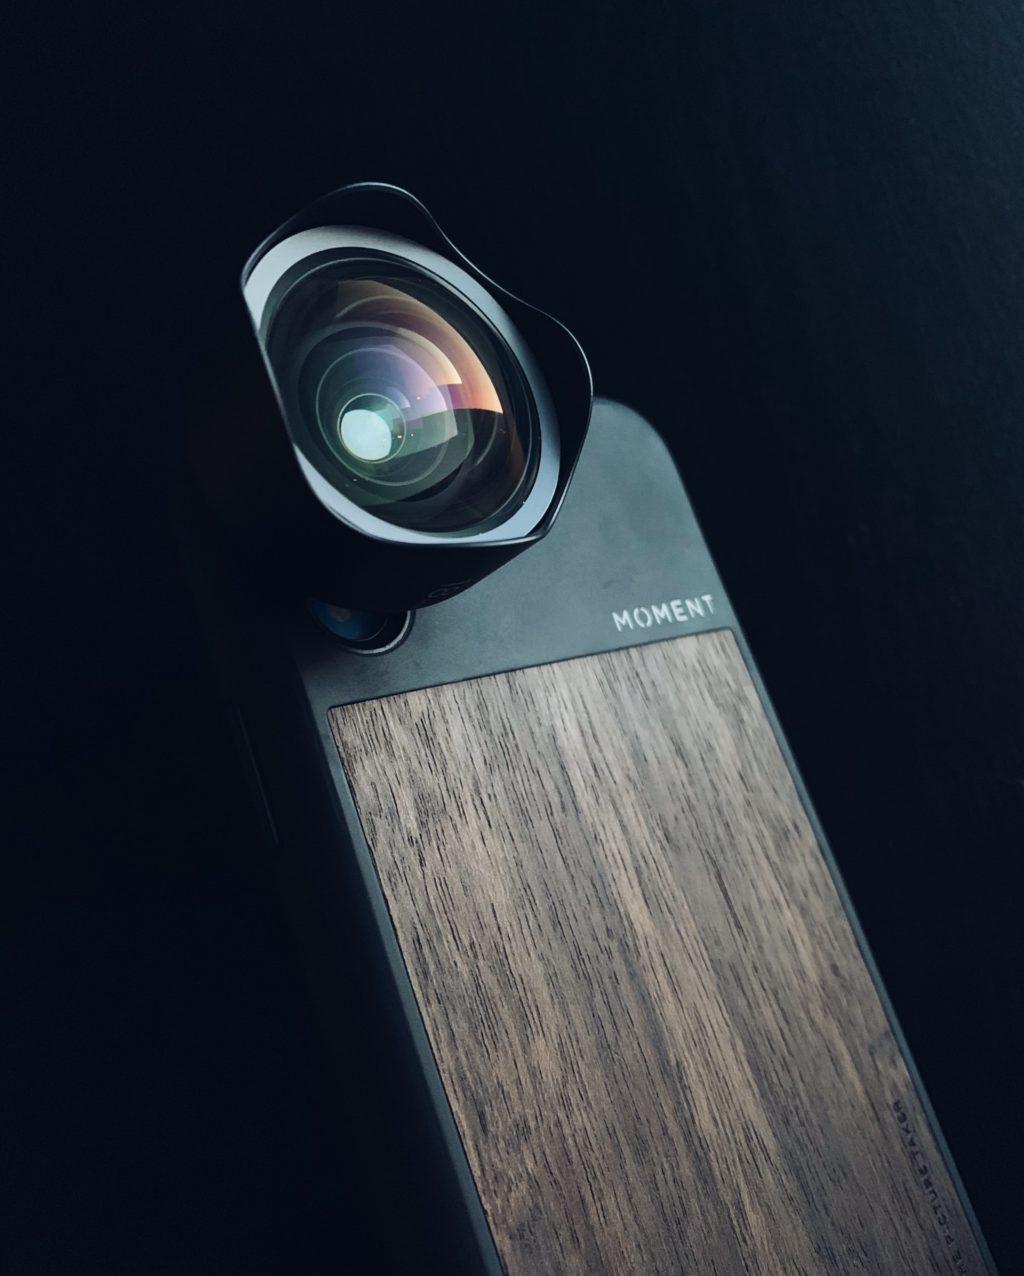 smartphone lens attachment